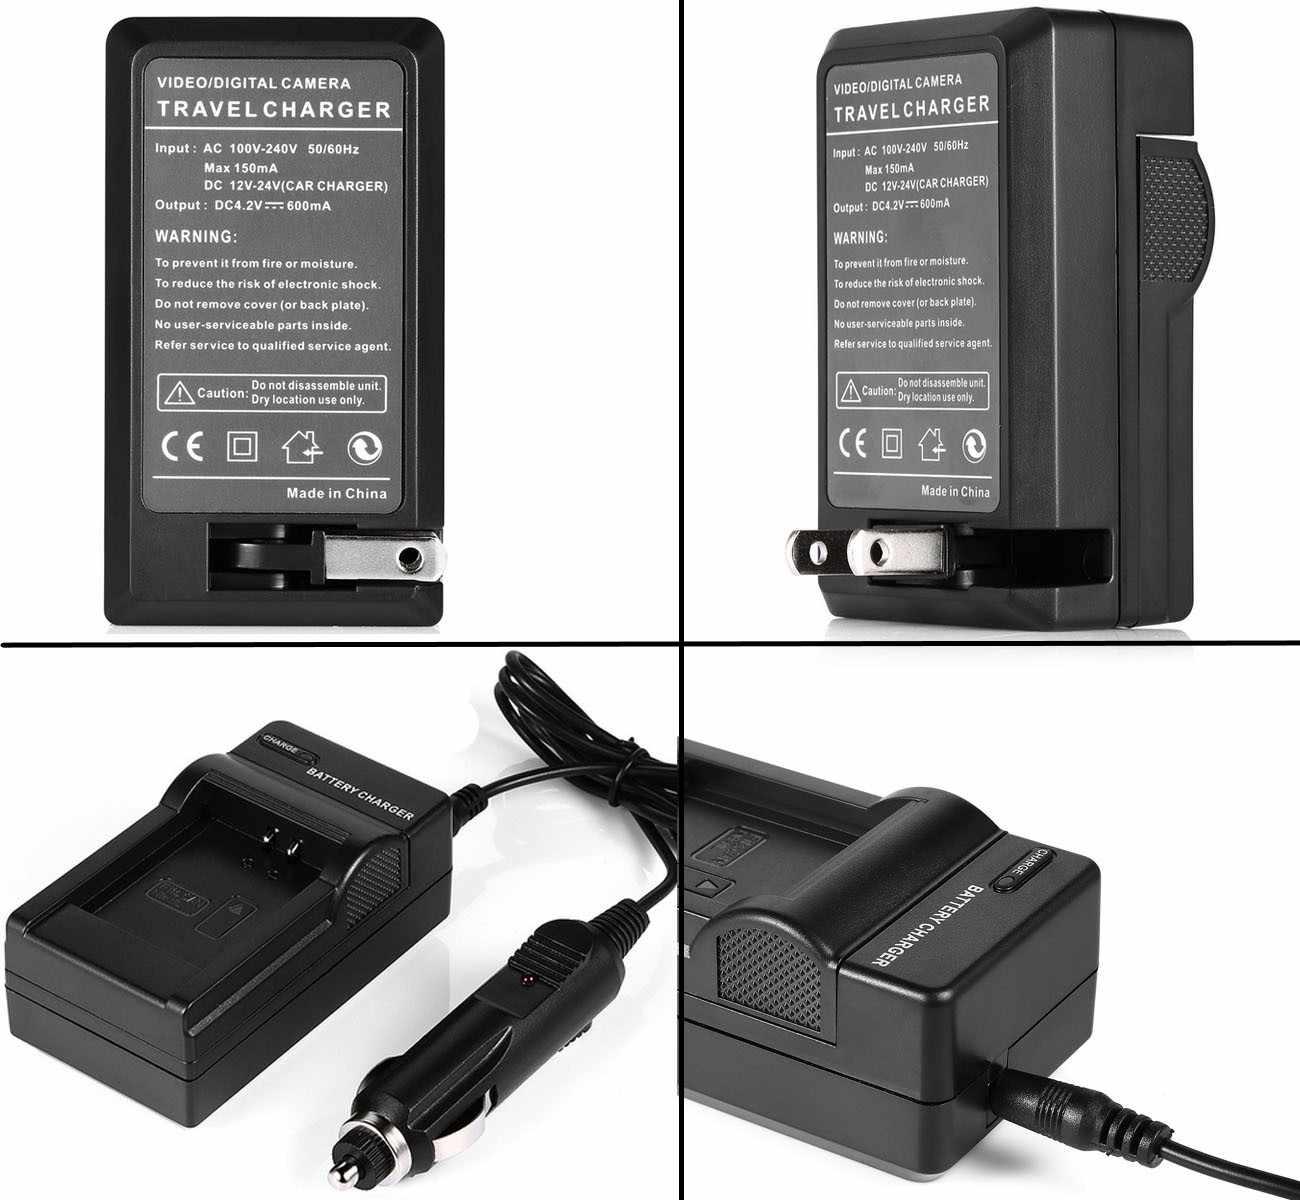 GR-D395EZ MiniDV Camcorder GR-D395EK GR-D395EX Battery Charger for JVC GR-D390EK